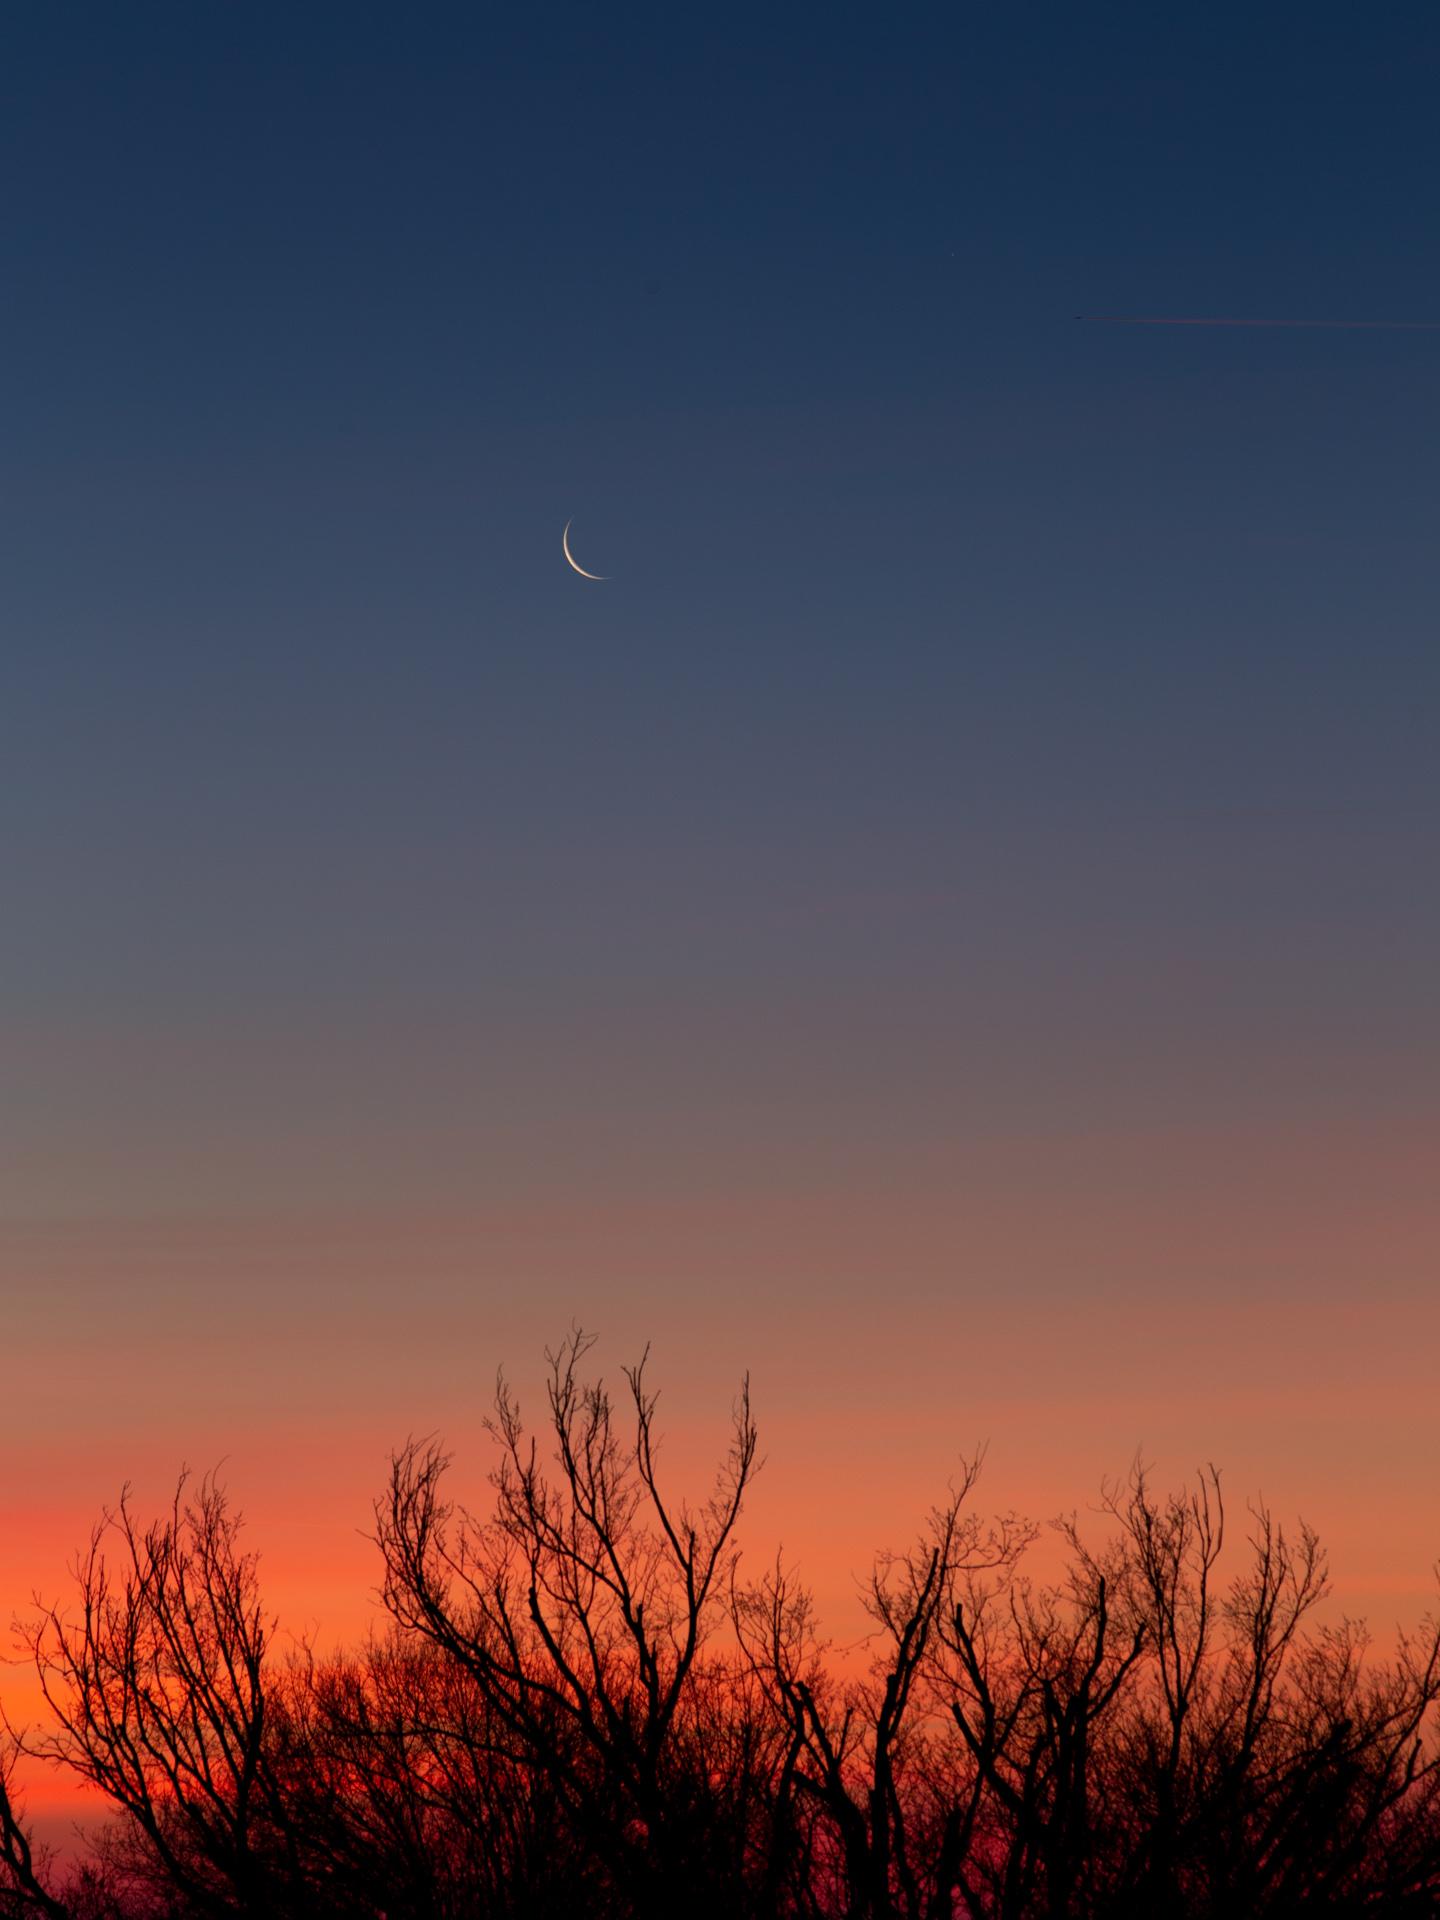 Waning Crescent Moon Rise | 20190202 0657 E:38.96x77.00@84m